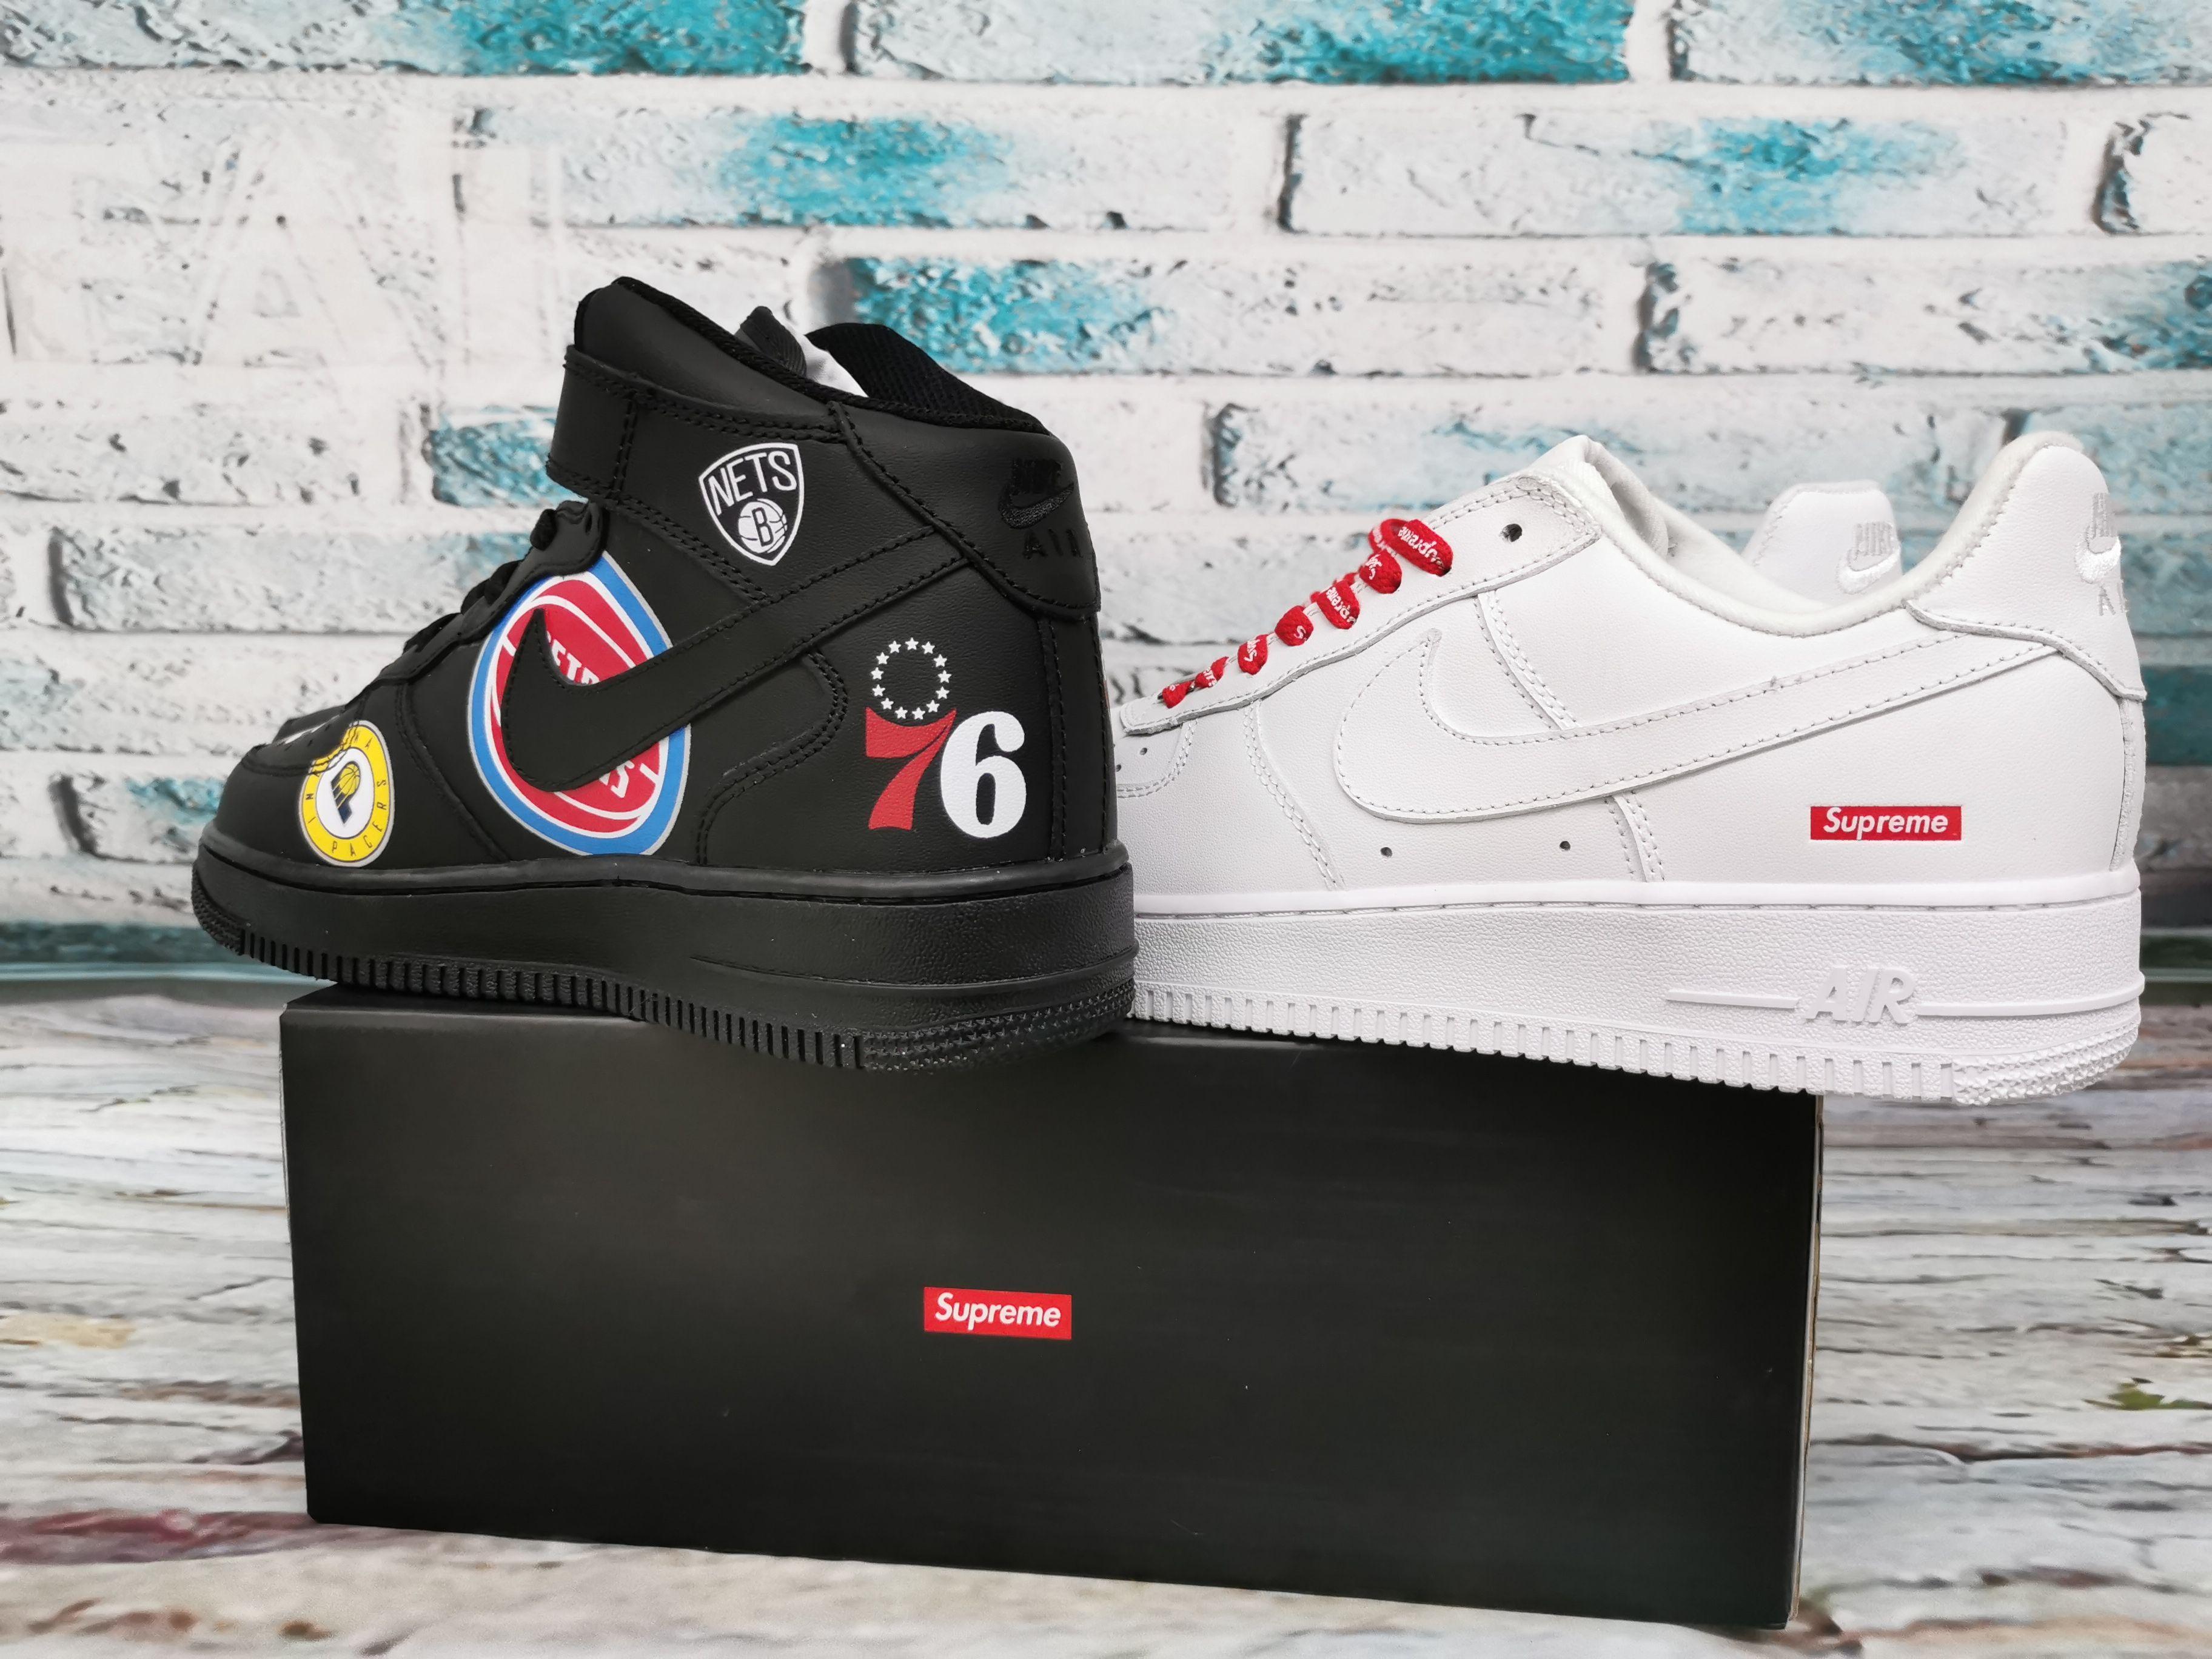 For Sale Kicks Supreme X Air Force 1 Low Box Logo White Shoes In 2020 Air Force Box Logo Air Force 1